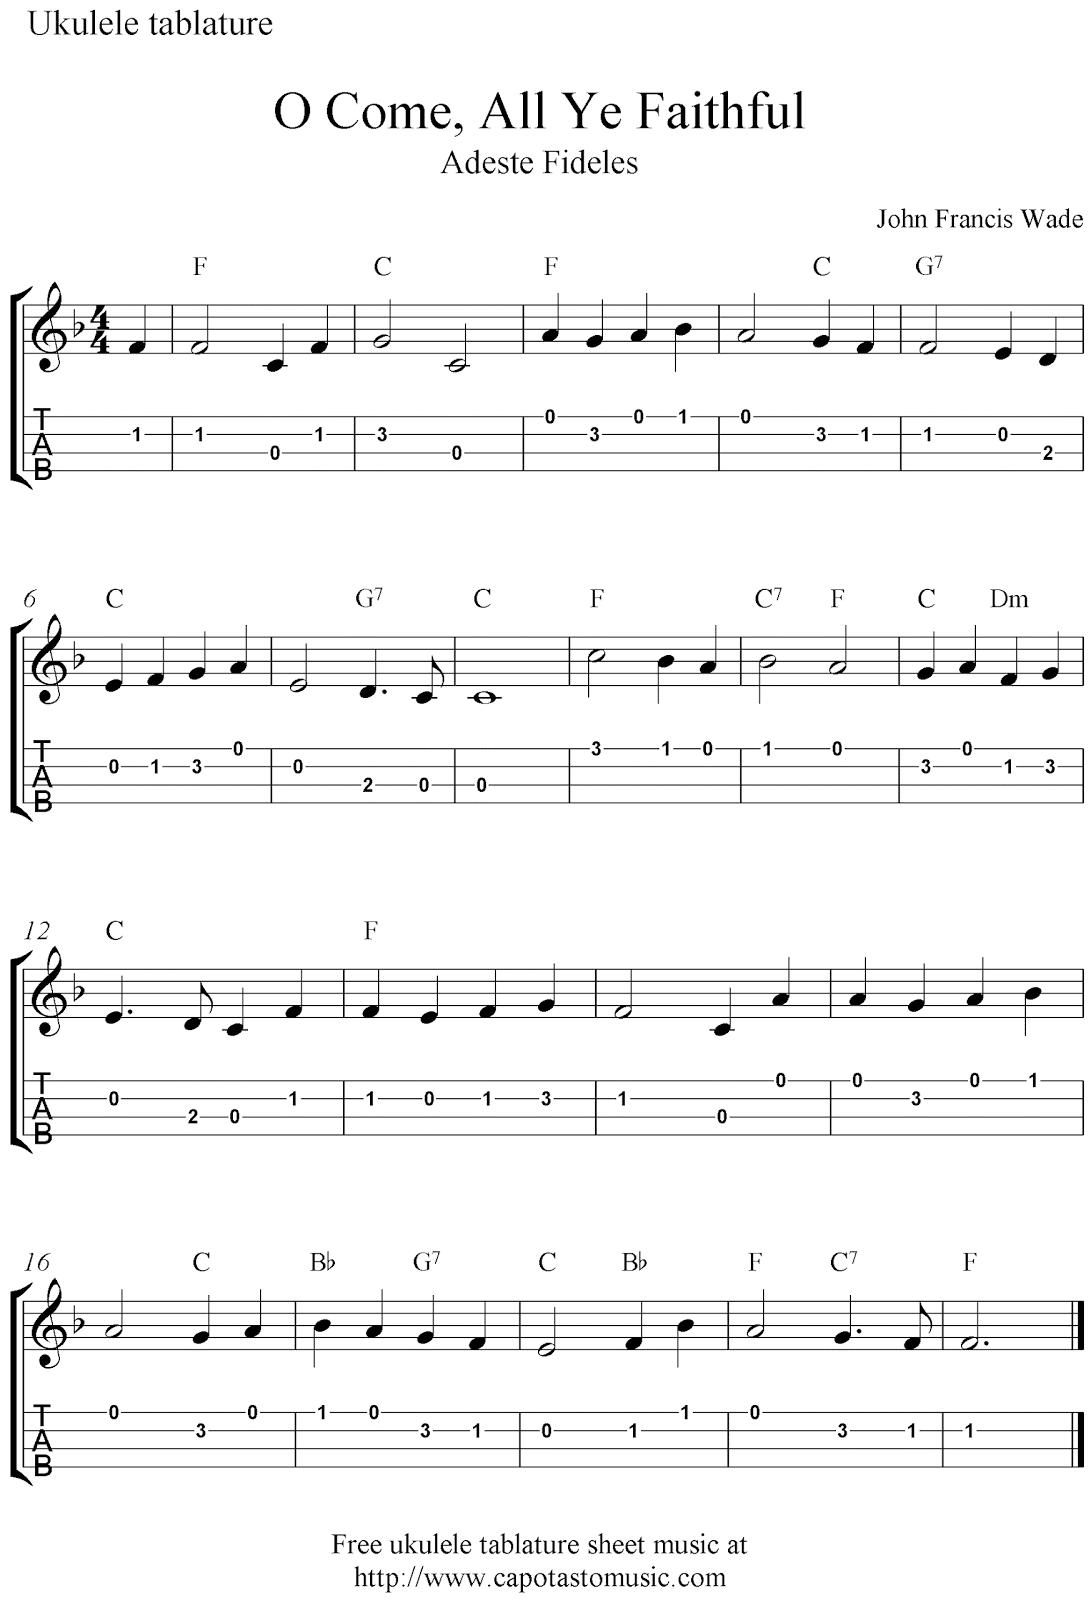 O Come, All Ye Faithful (Adeste Fideles), free Christmas ukulele tab sheet music